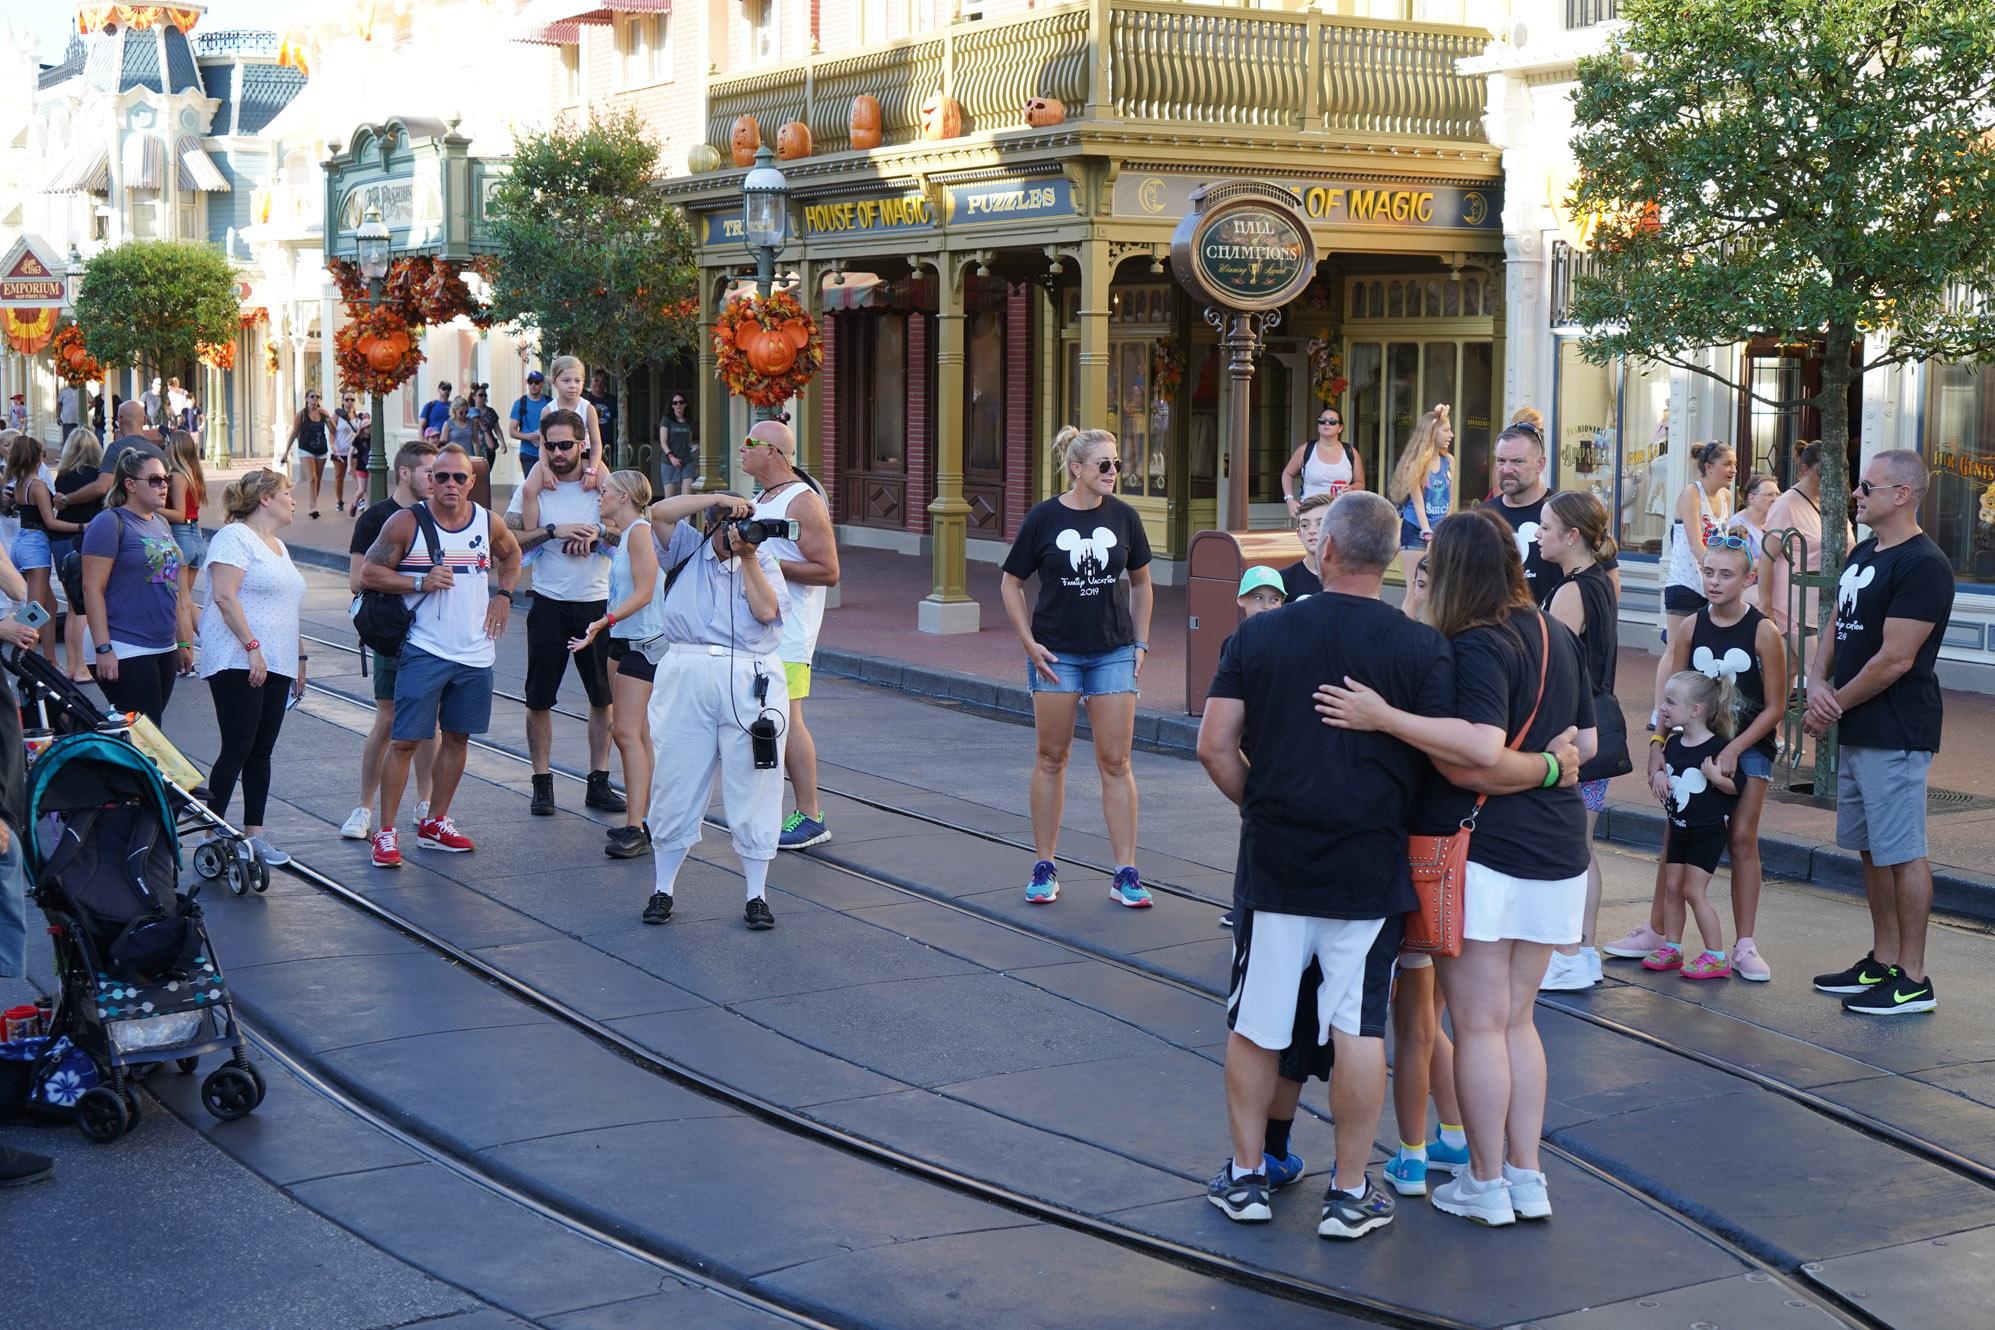 crowds in Magic Kingdom